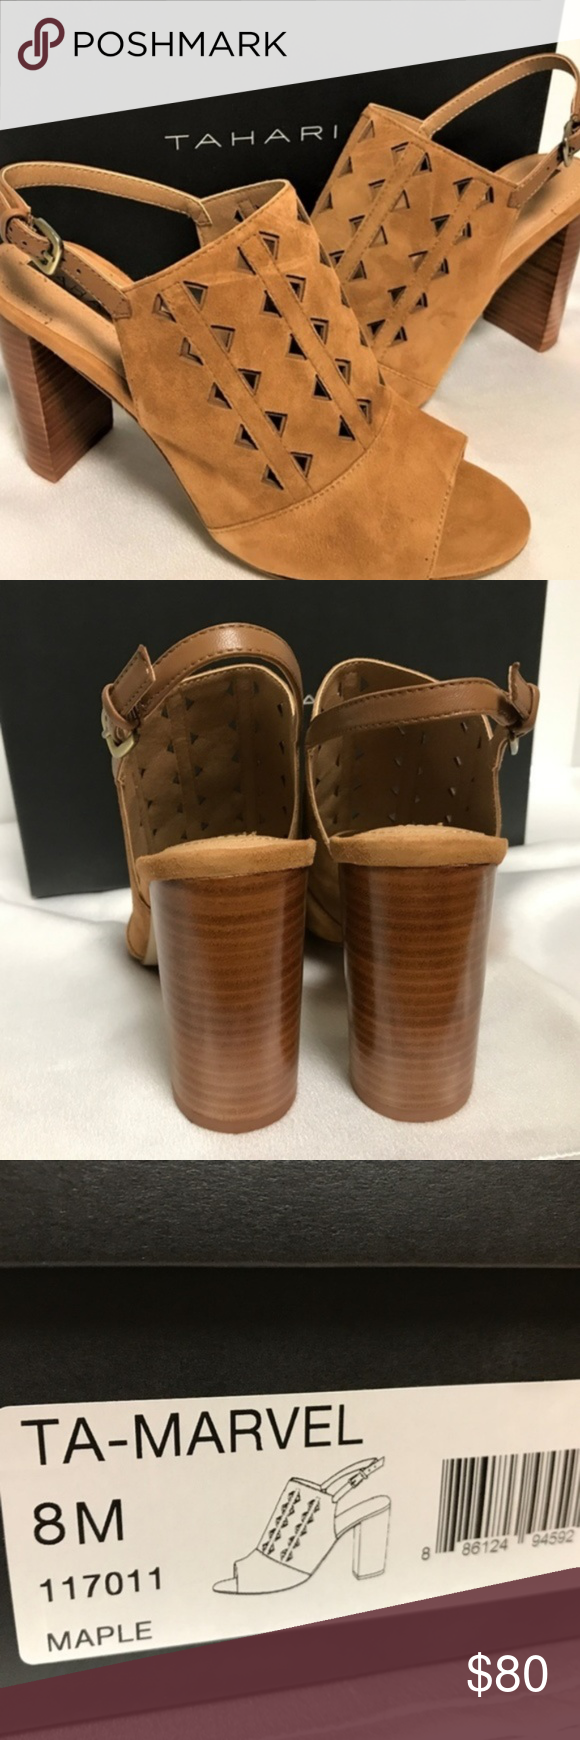 9cdfb89b46 Tahari Womens 8M Open Toe Sandal Sling Backs Brown shoppethefinds Updated 3  hours ago Edit Listing